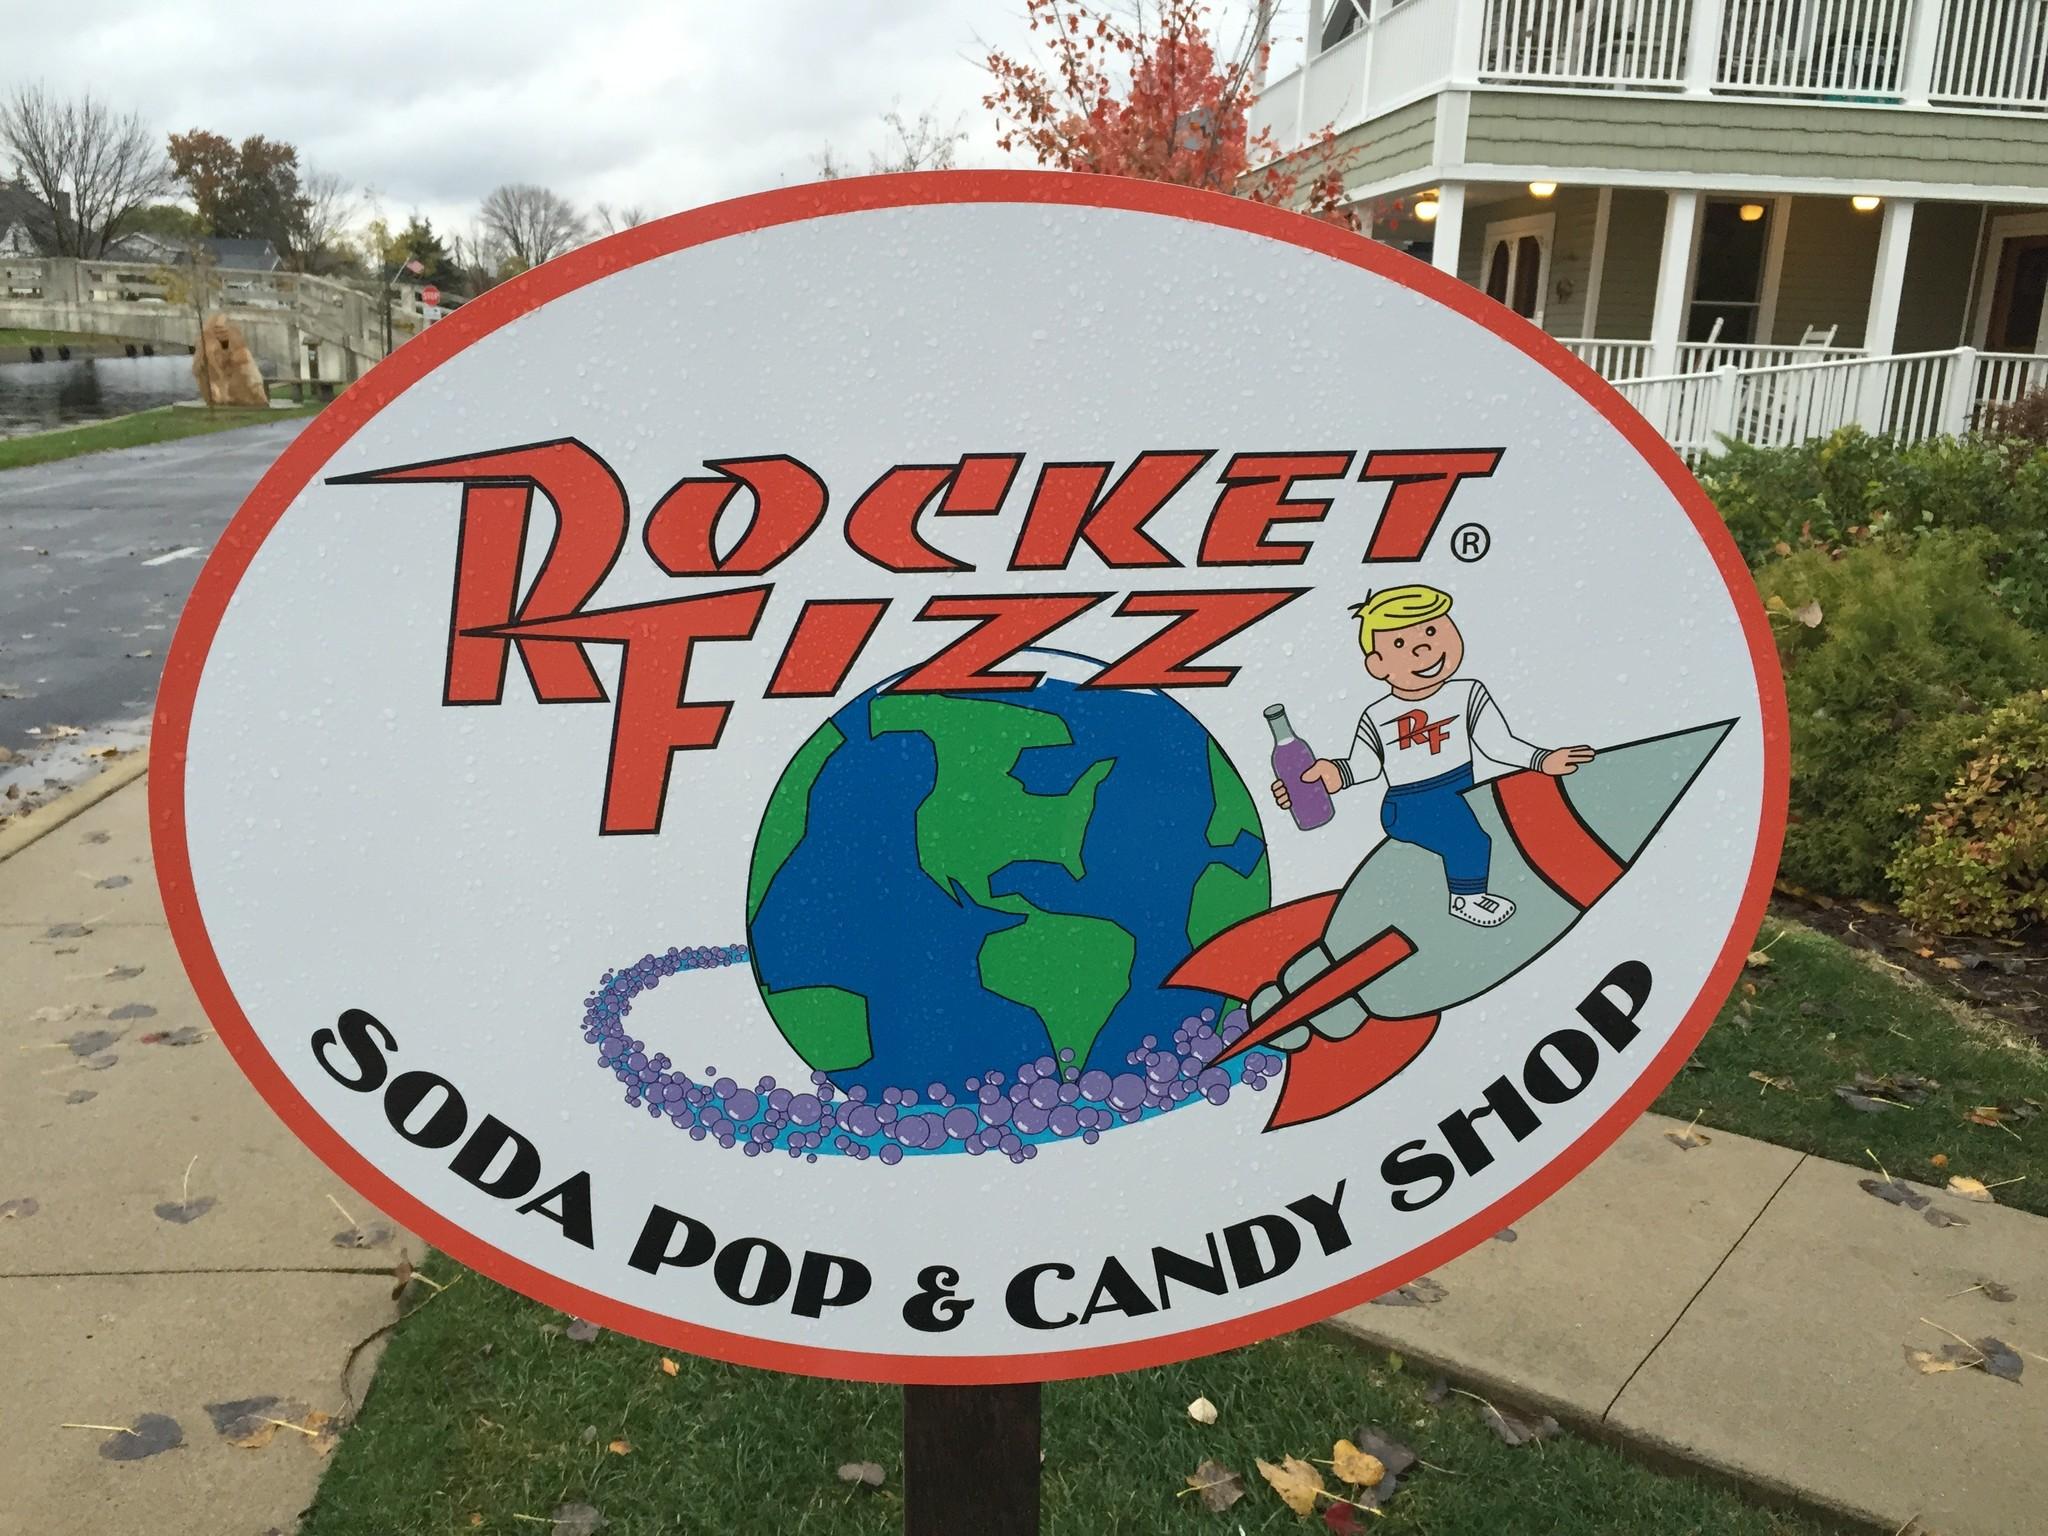 Rocket Fizz Soda Pop & Candy Shop Winona Lake